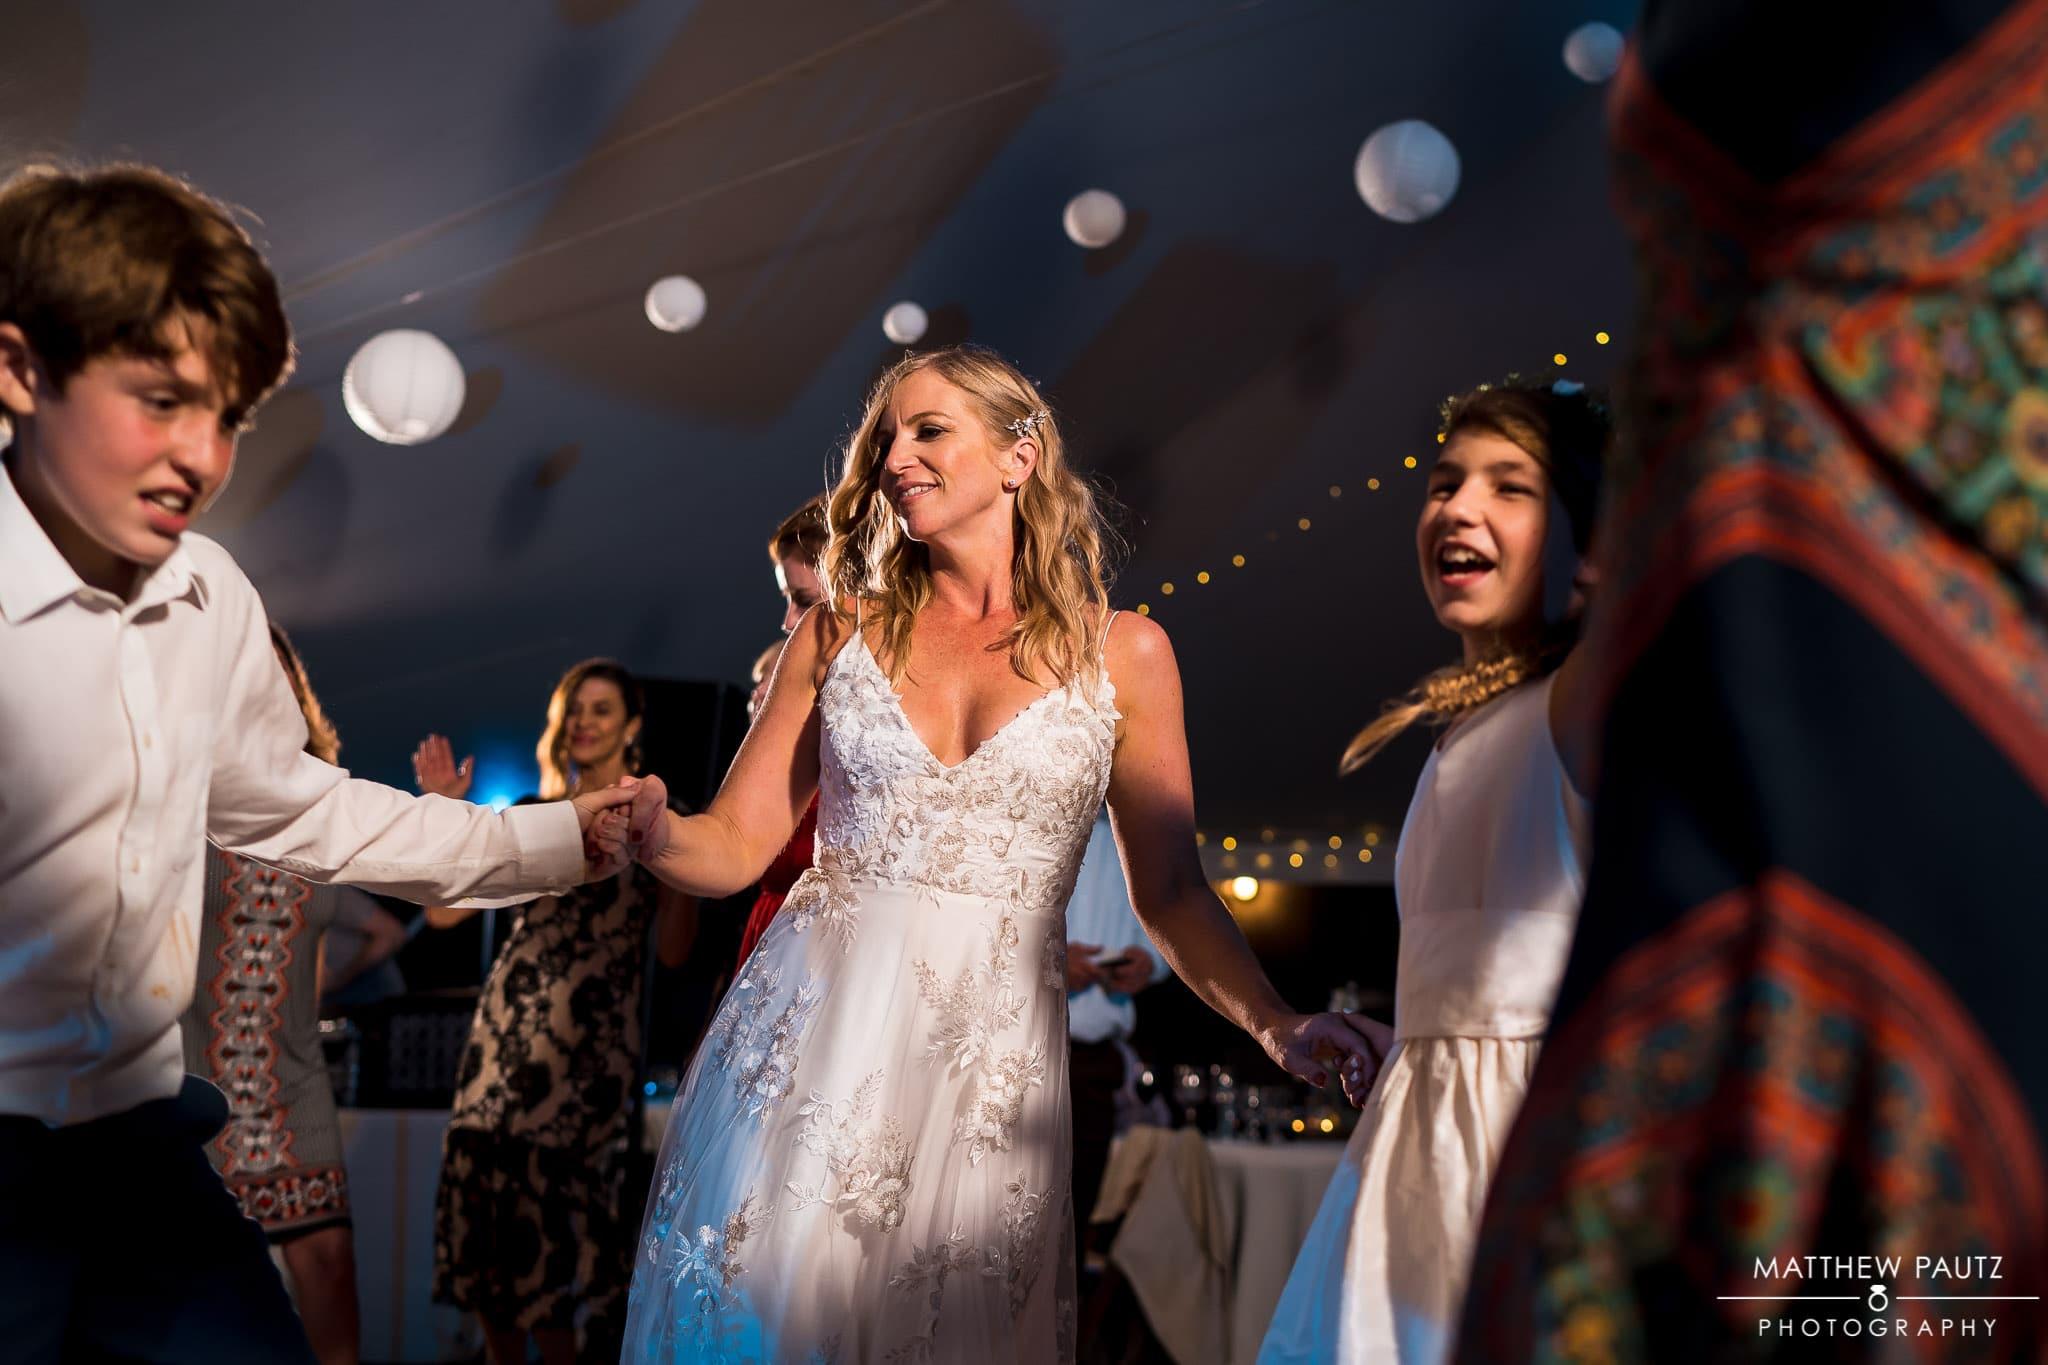 bride dancing at wedding reception at junebug retro resort